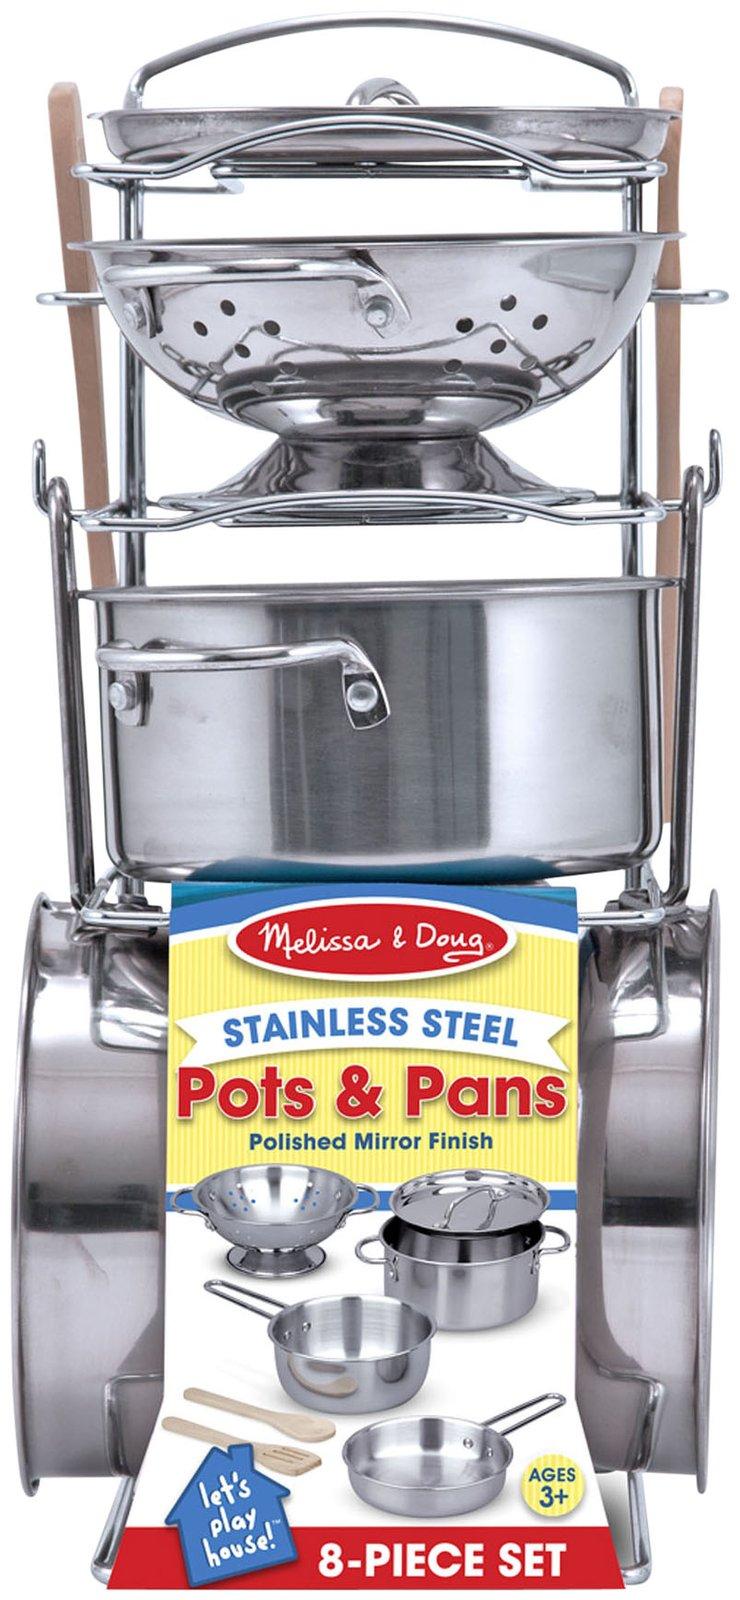 Pots & Pans Set by Melissa & Doug, Ages 3+ sale price $23.99 (regular price $29.99)